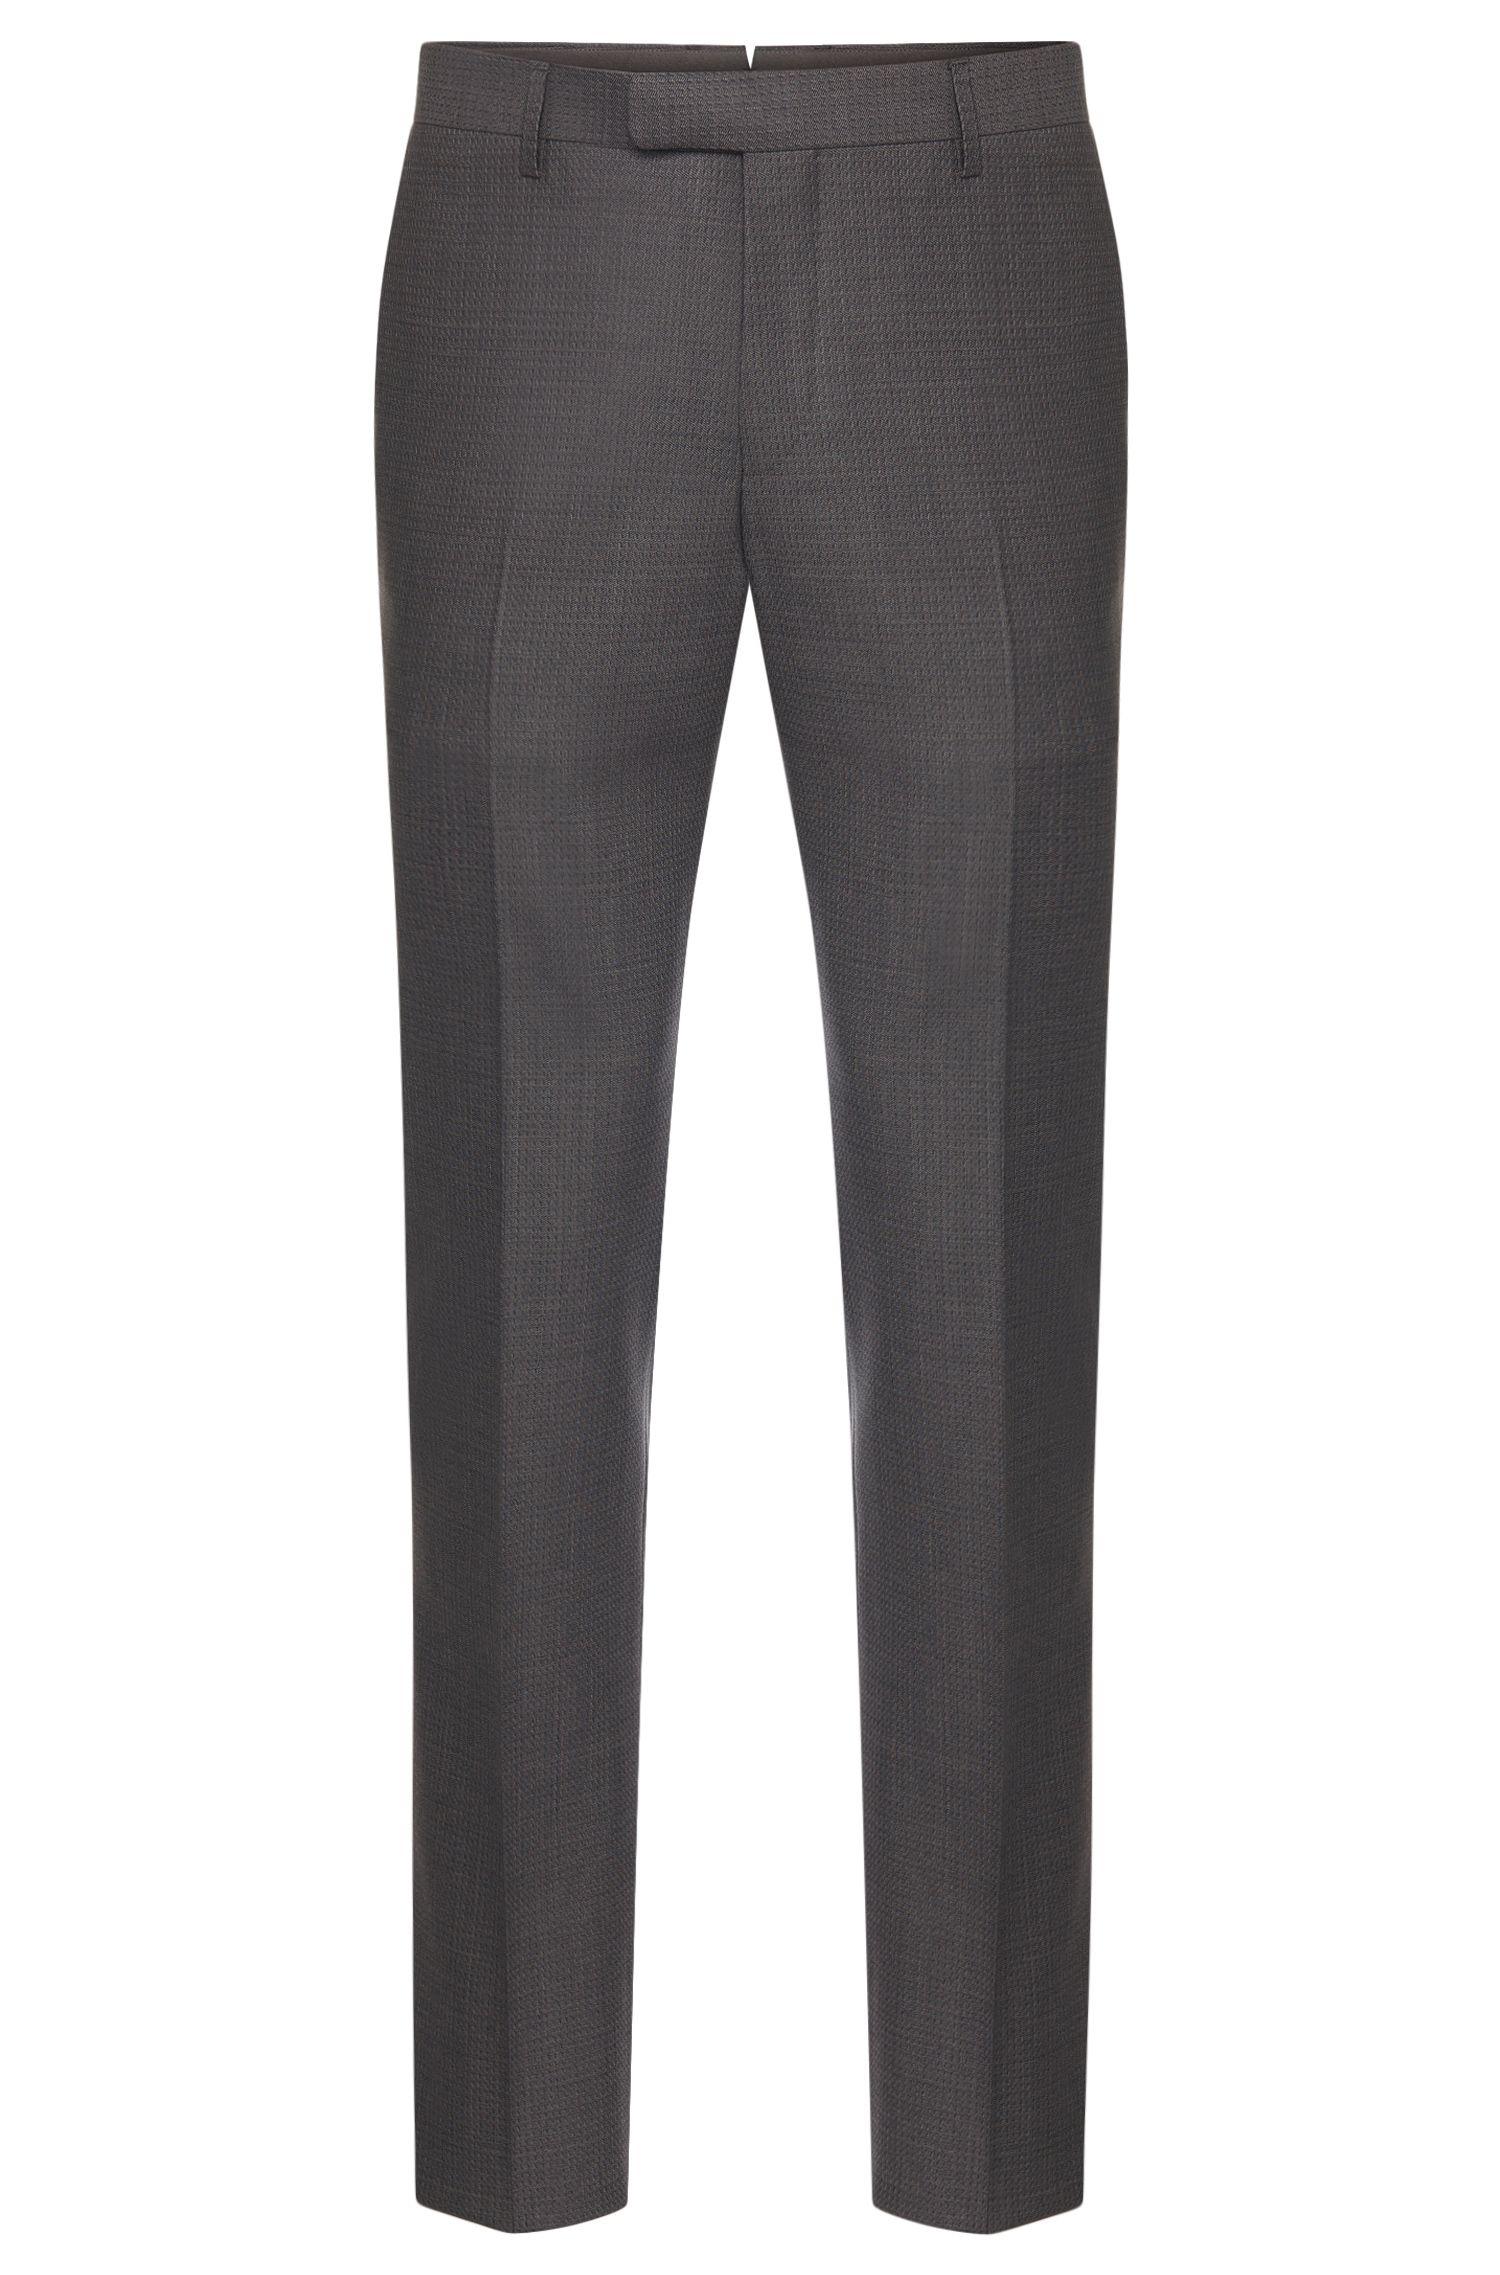 'T-Gilmond' | Slim Fit, Italian Virgin Wool Jacquard Dress Pants